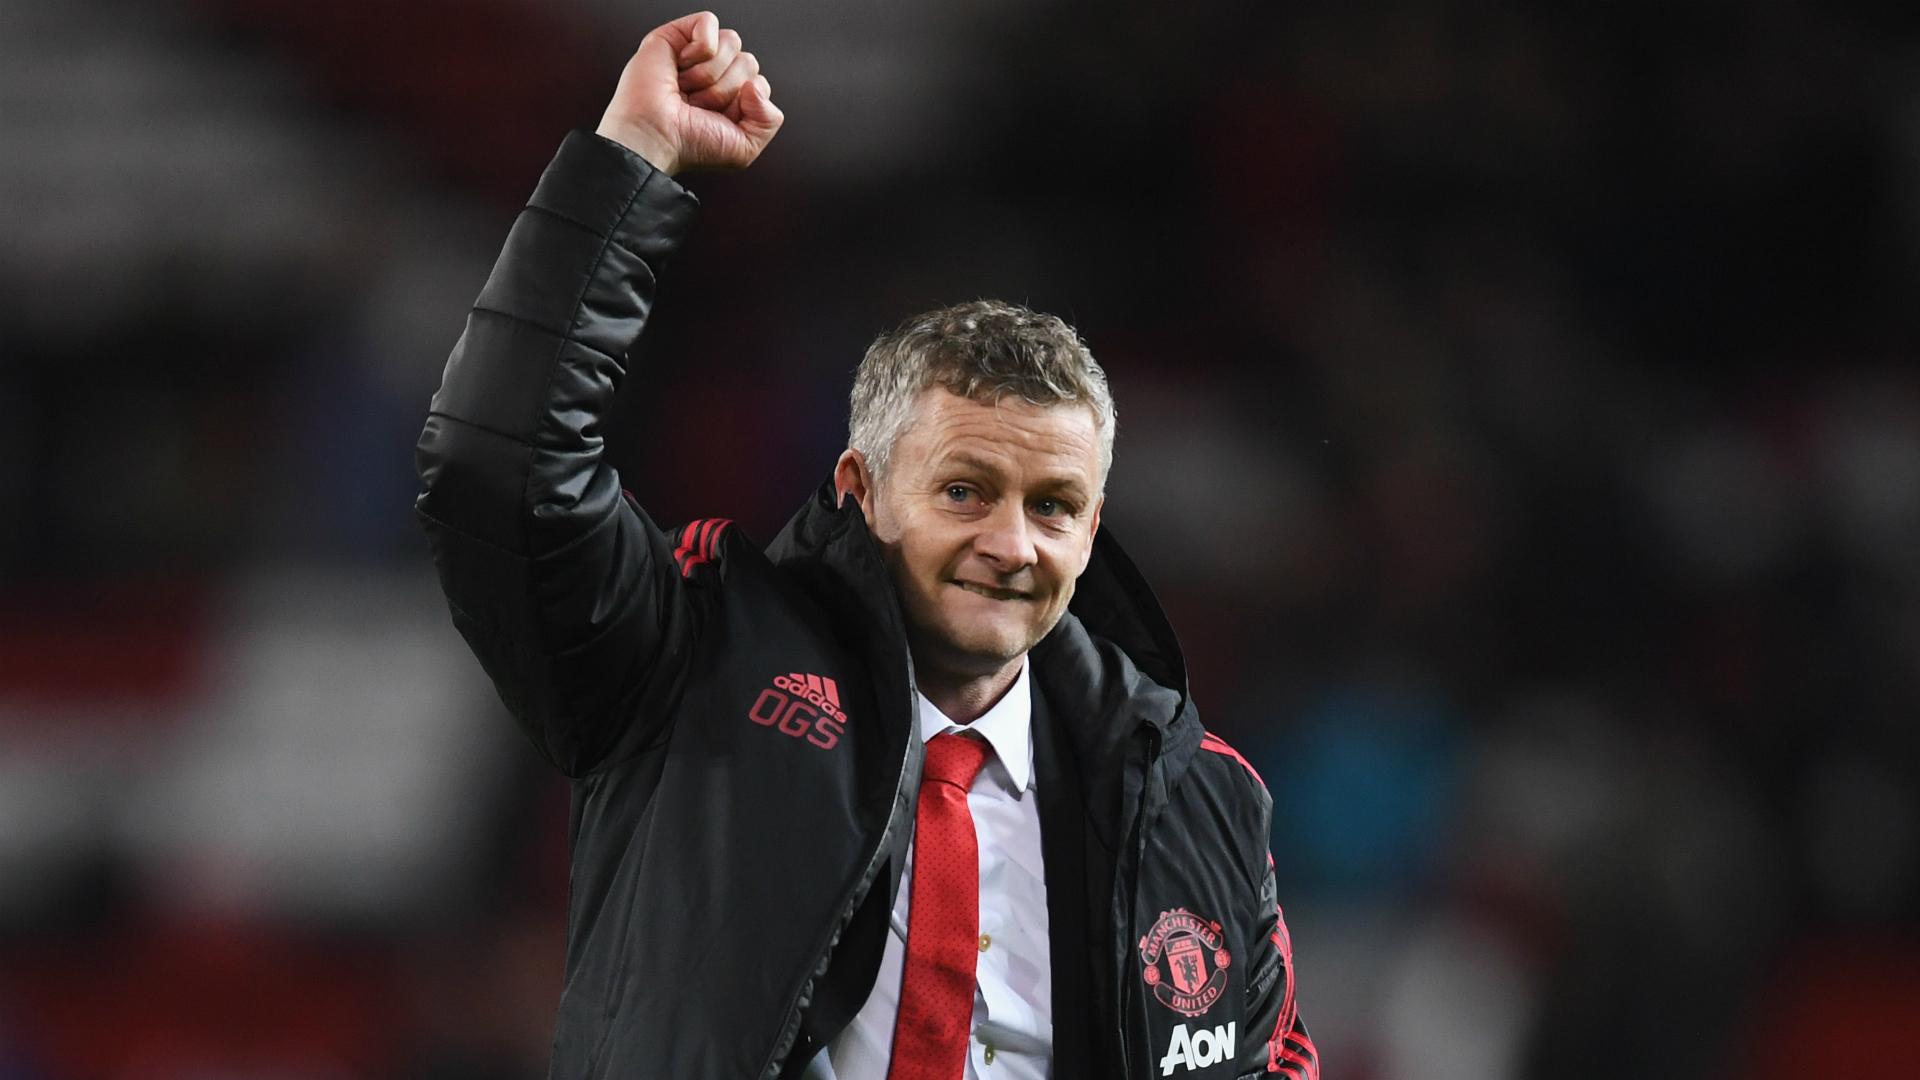 No doubt Solskjaer will get United job - Klopp